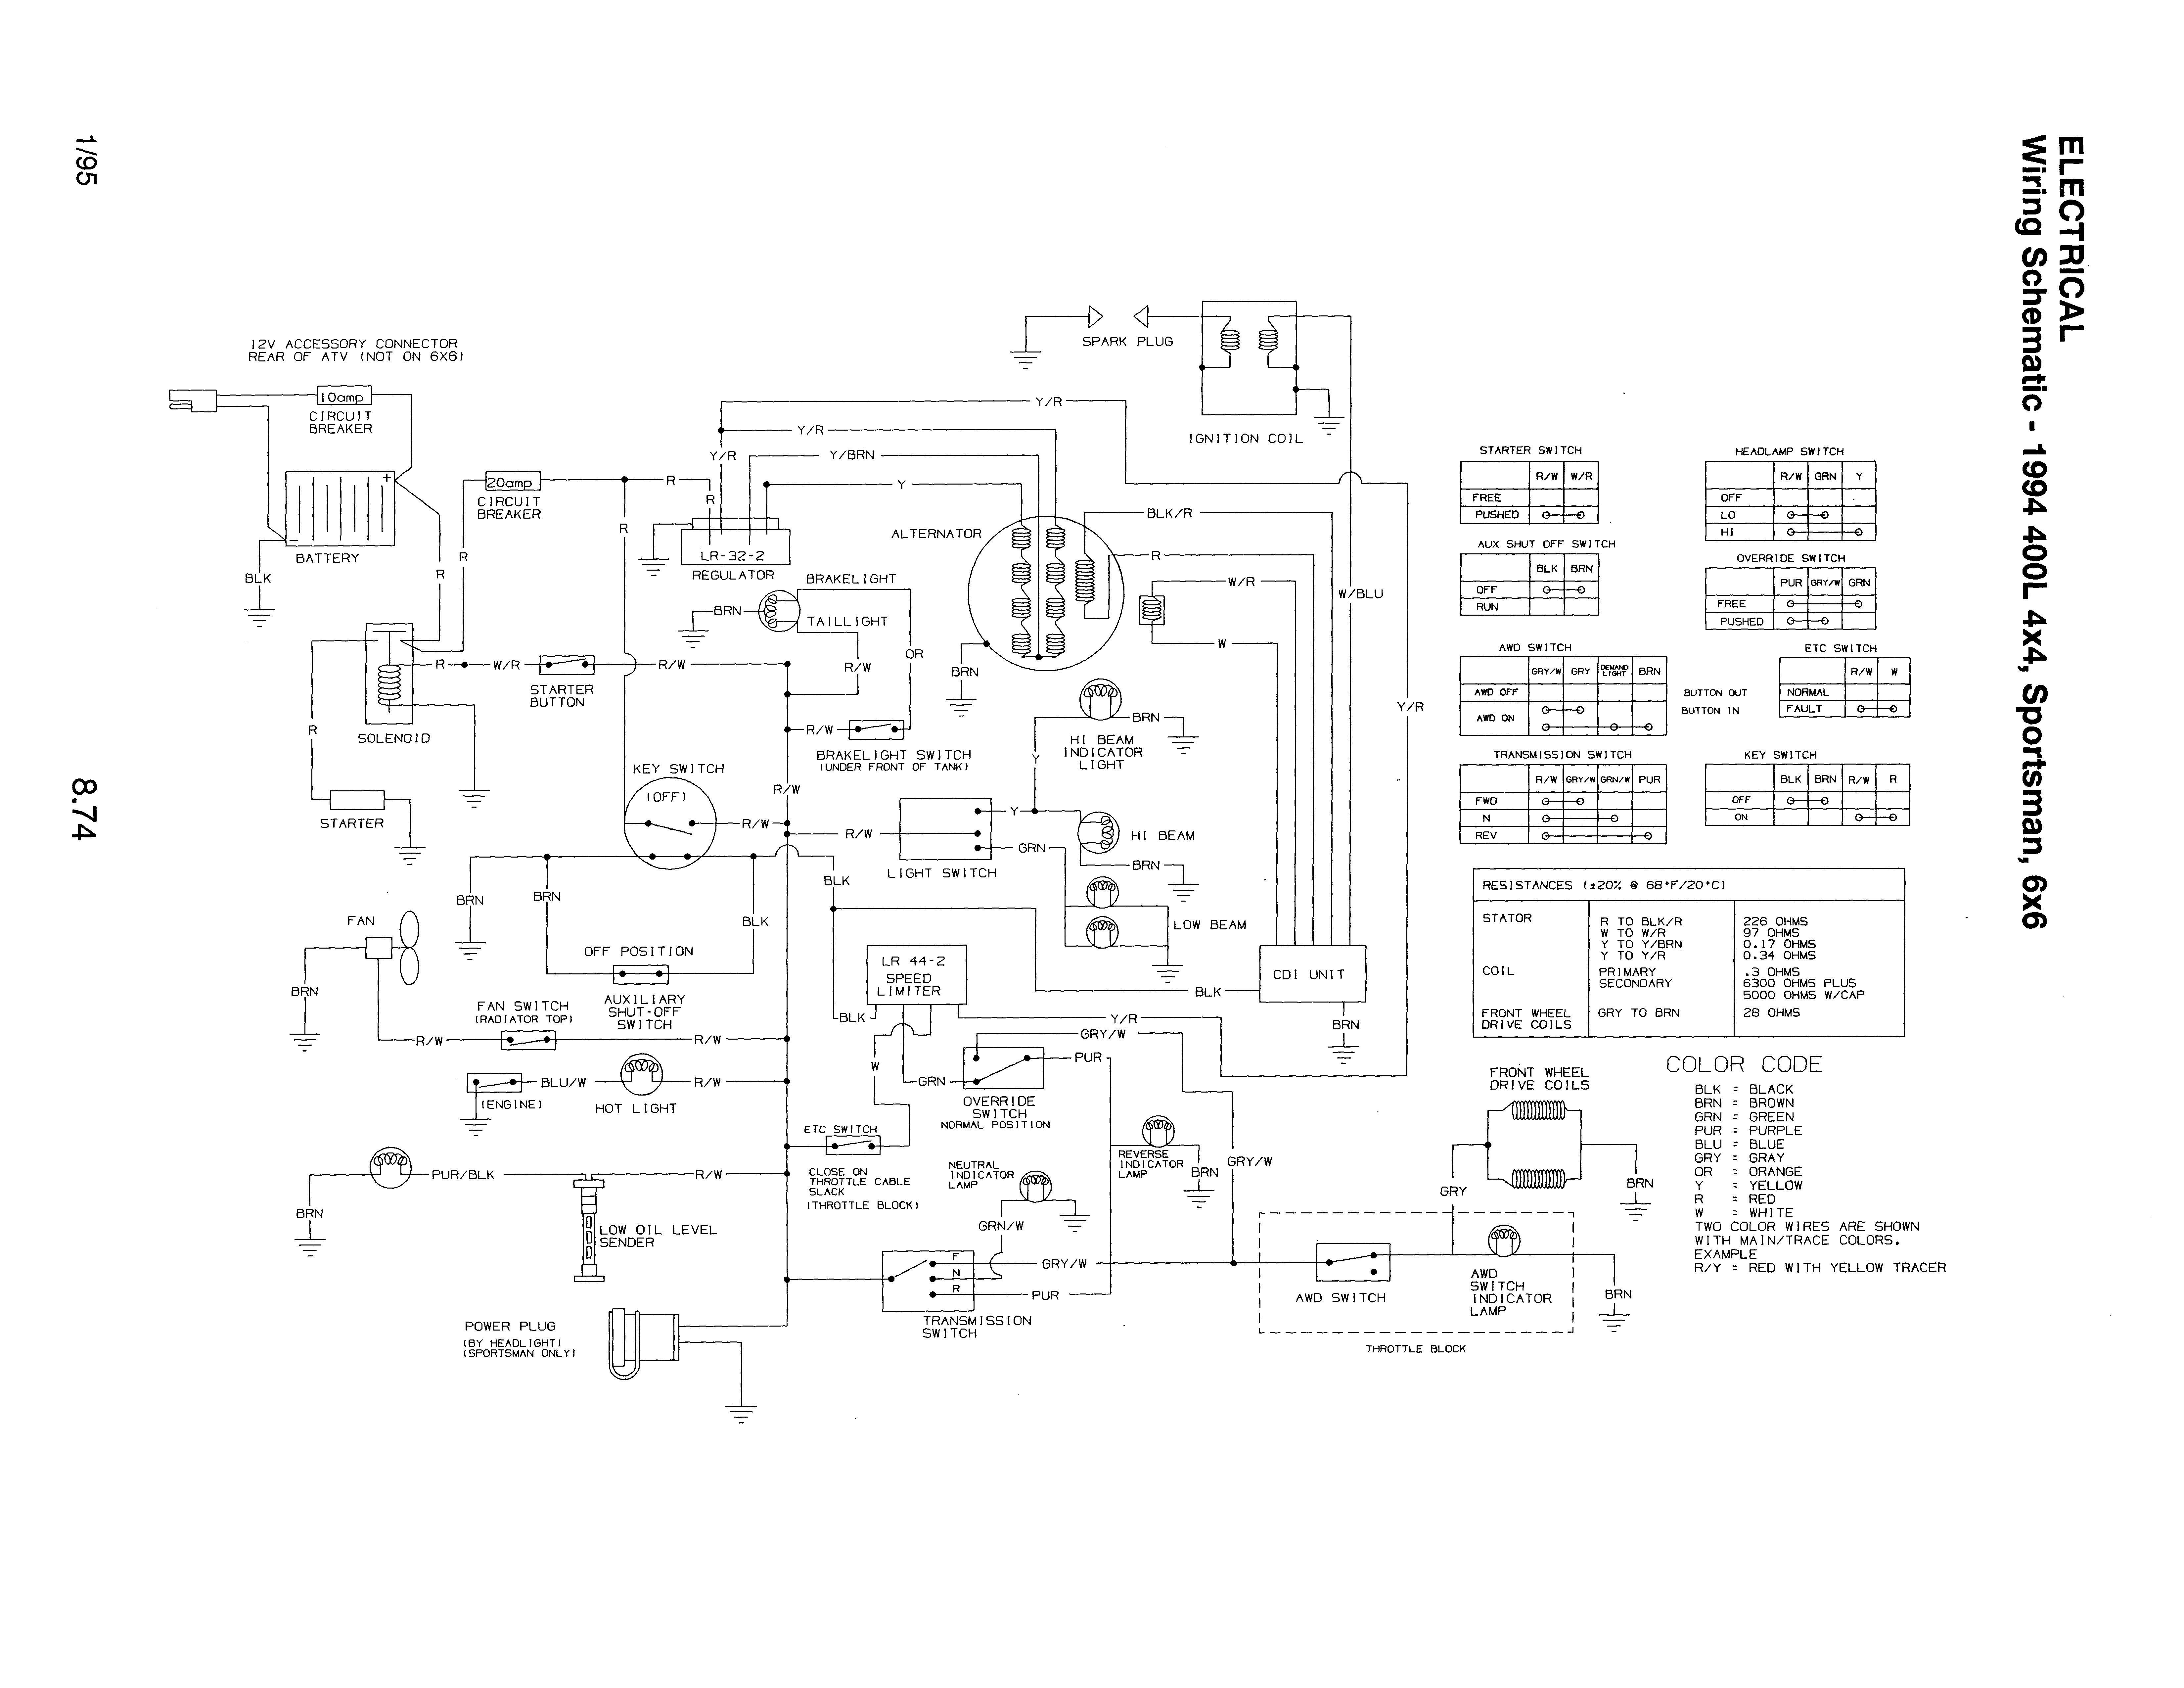 Polari Ranger 4x4 Wiring Diagram